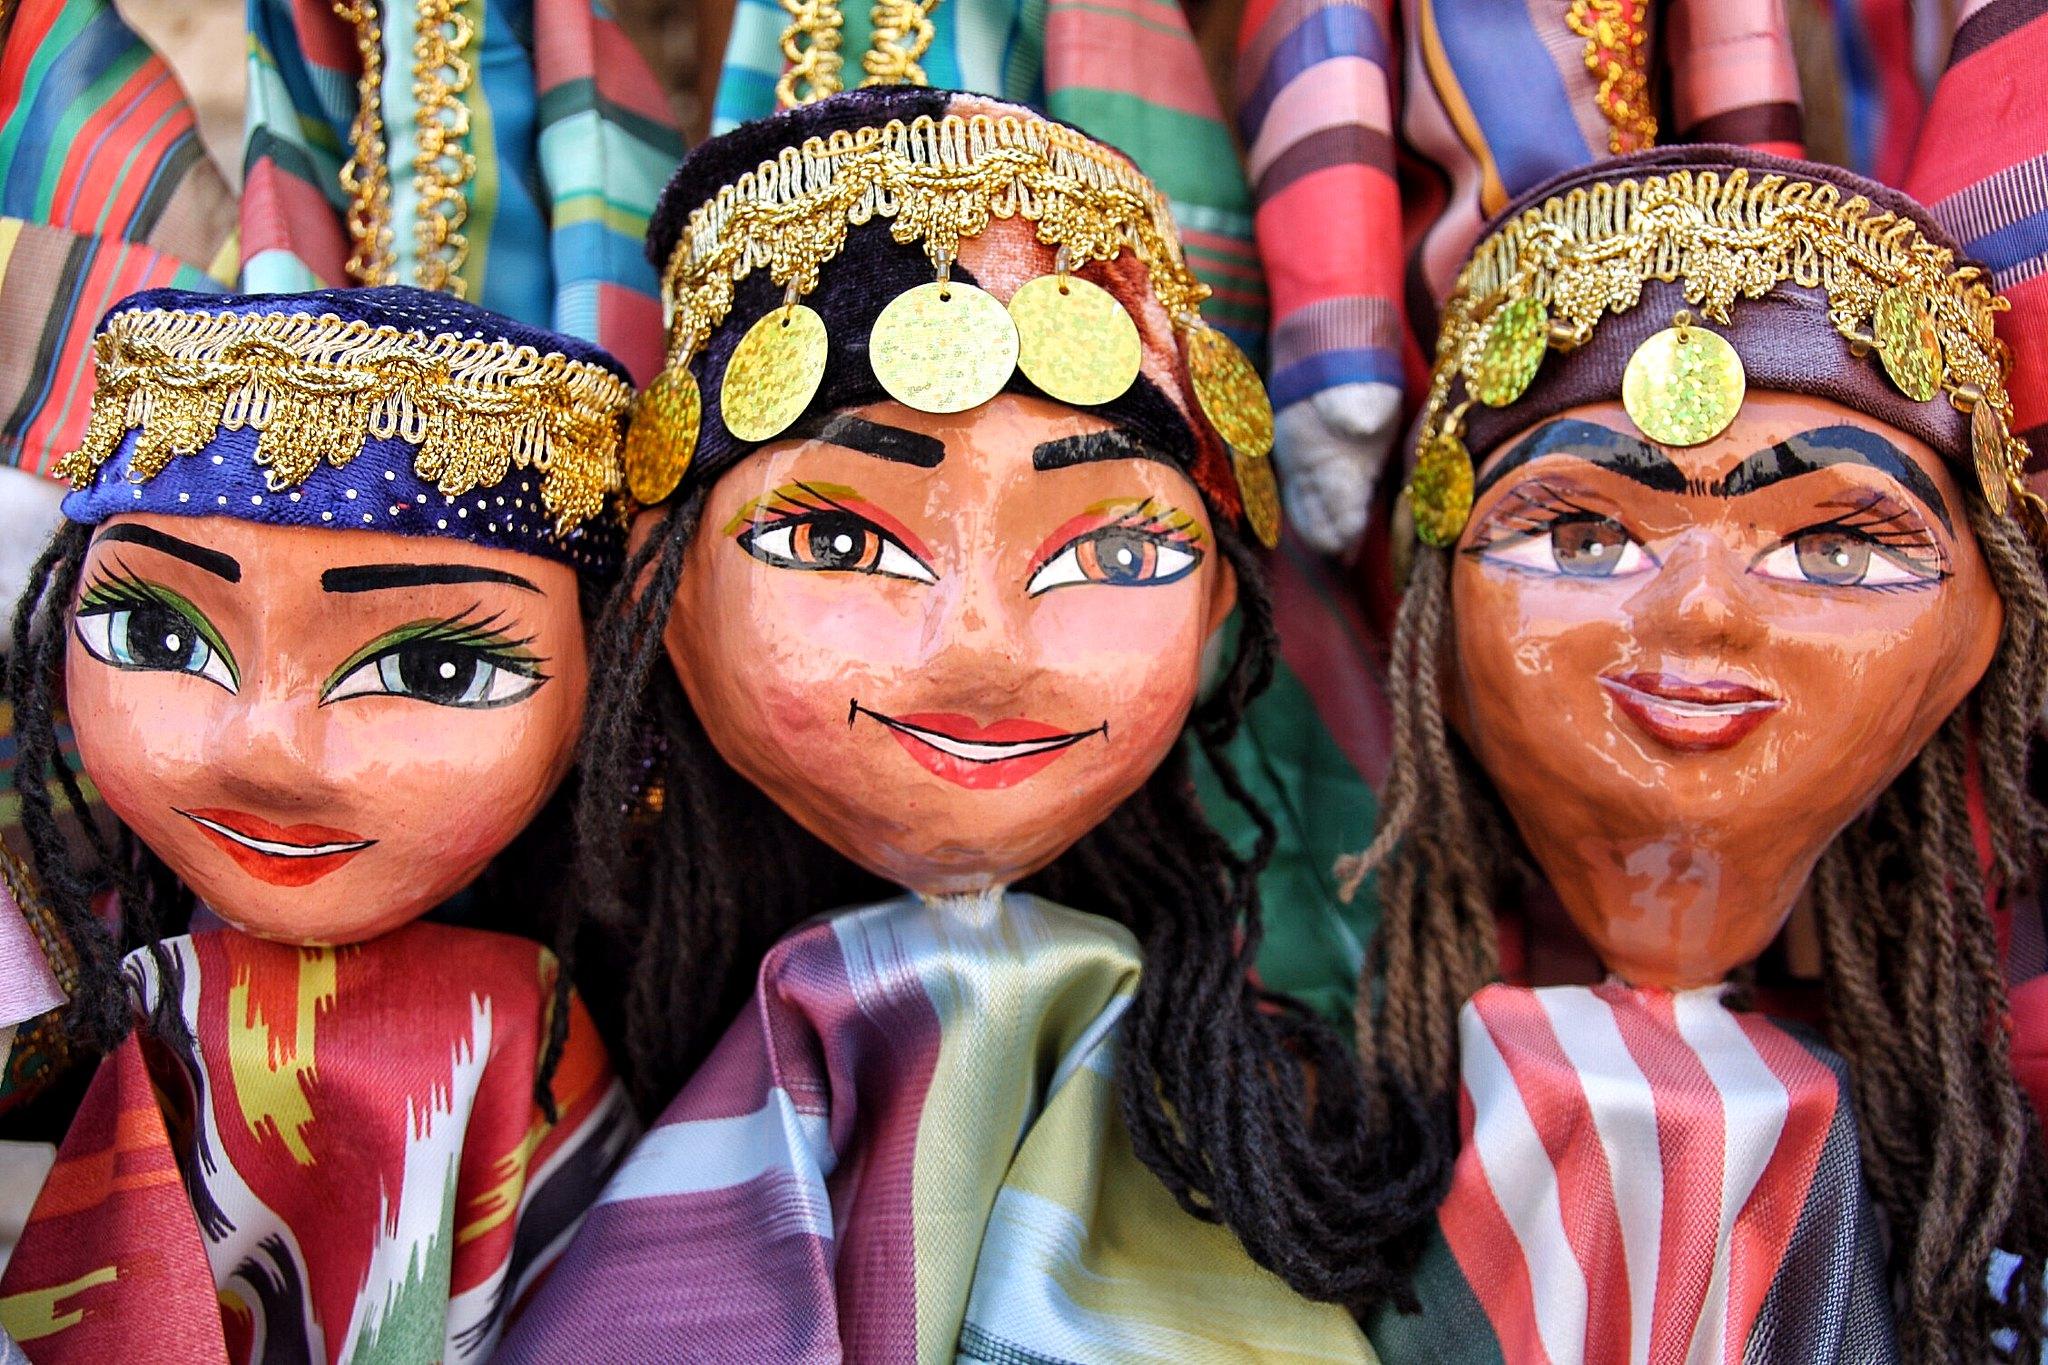 Puppets from Khiva-Uzbekistan